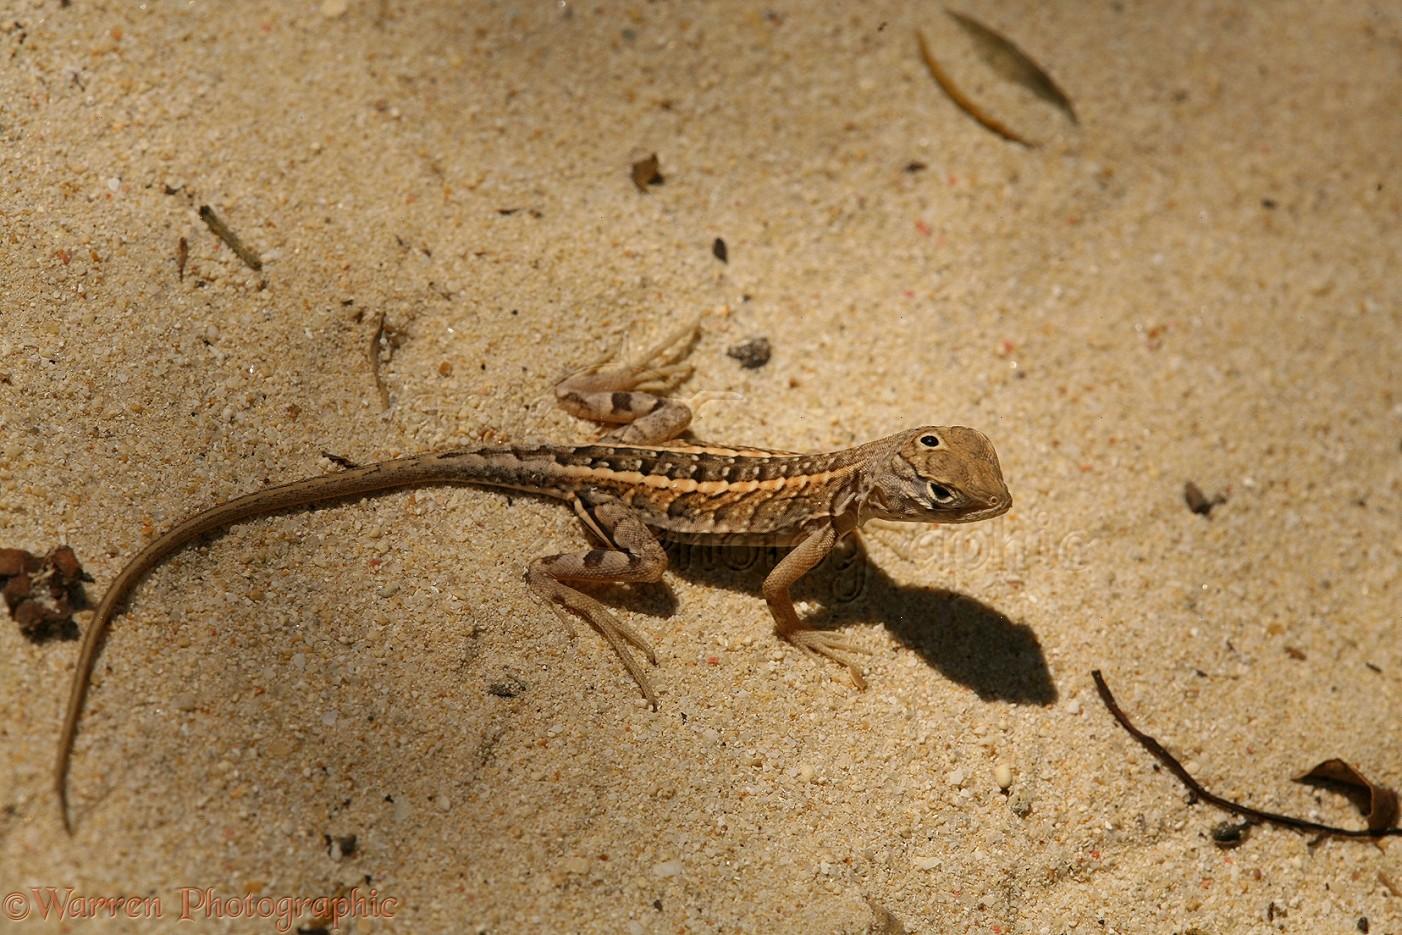 Three-eyed Iguanid Lizard (Chalaradon madargascariensis)